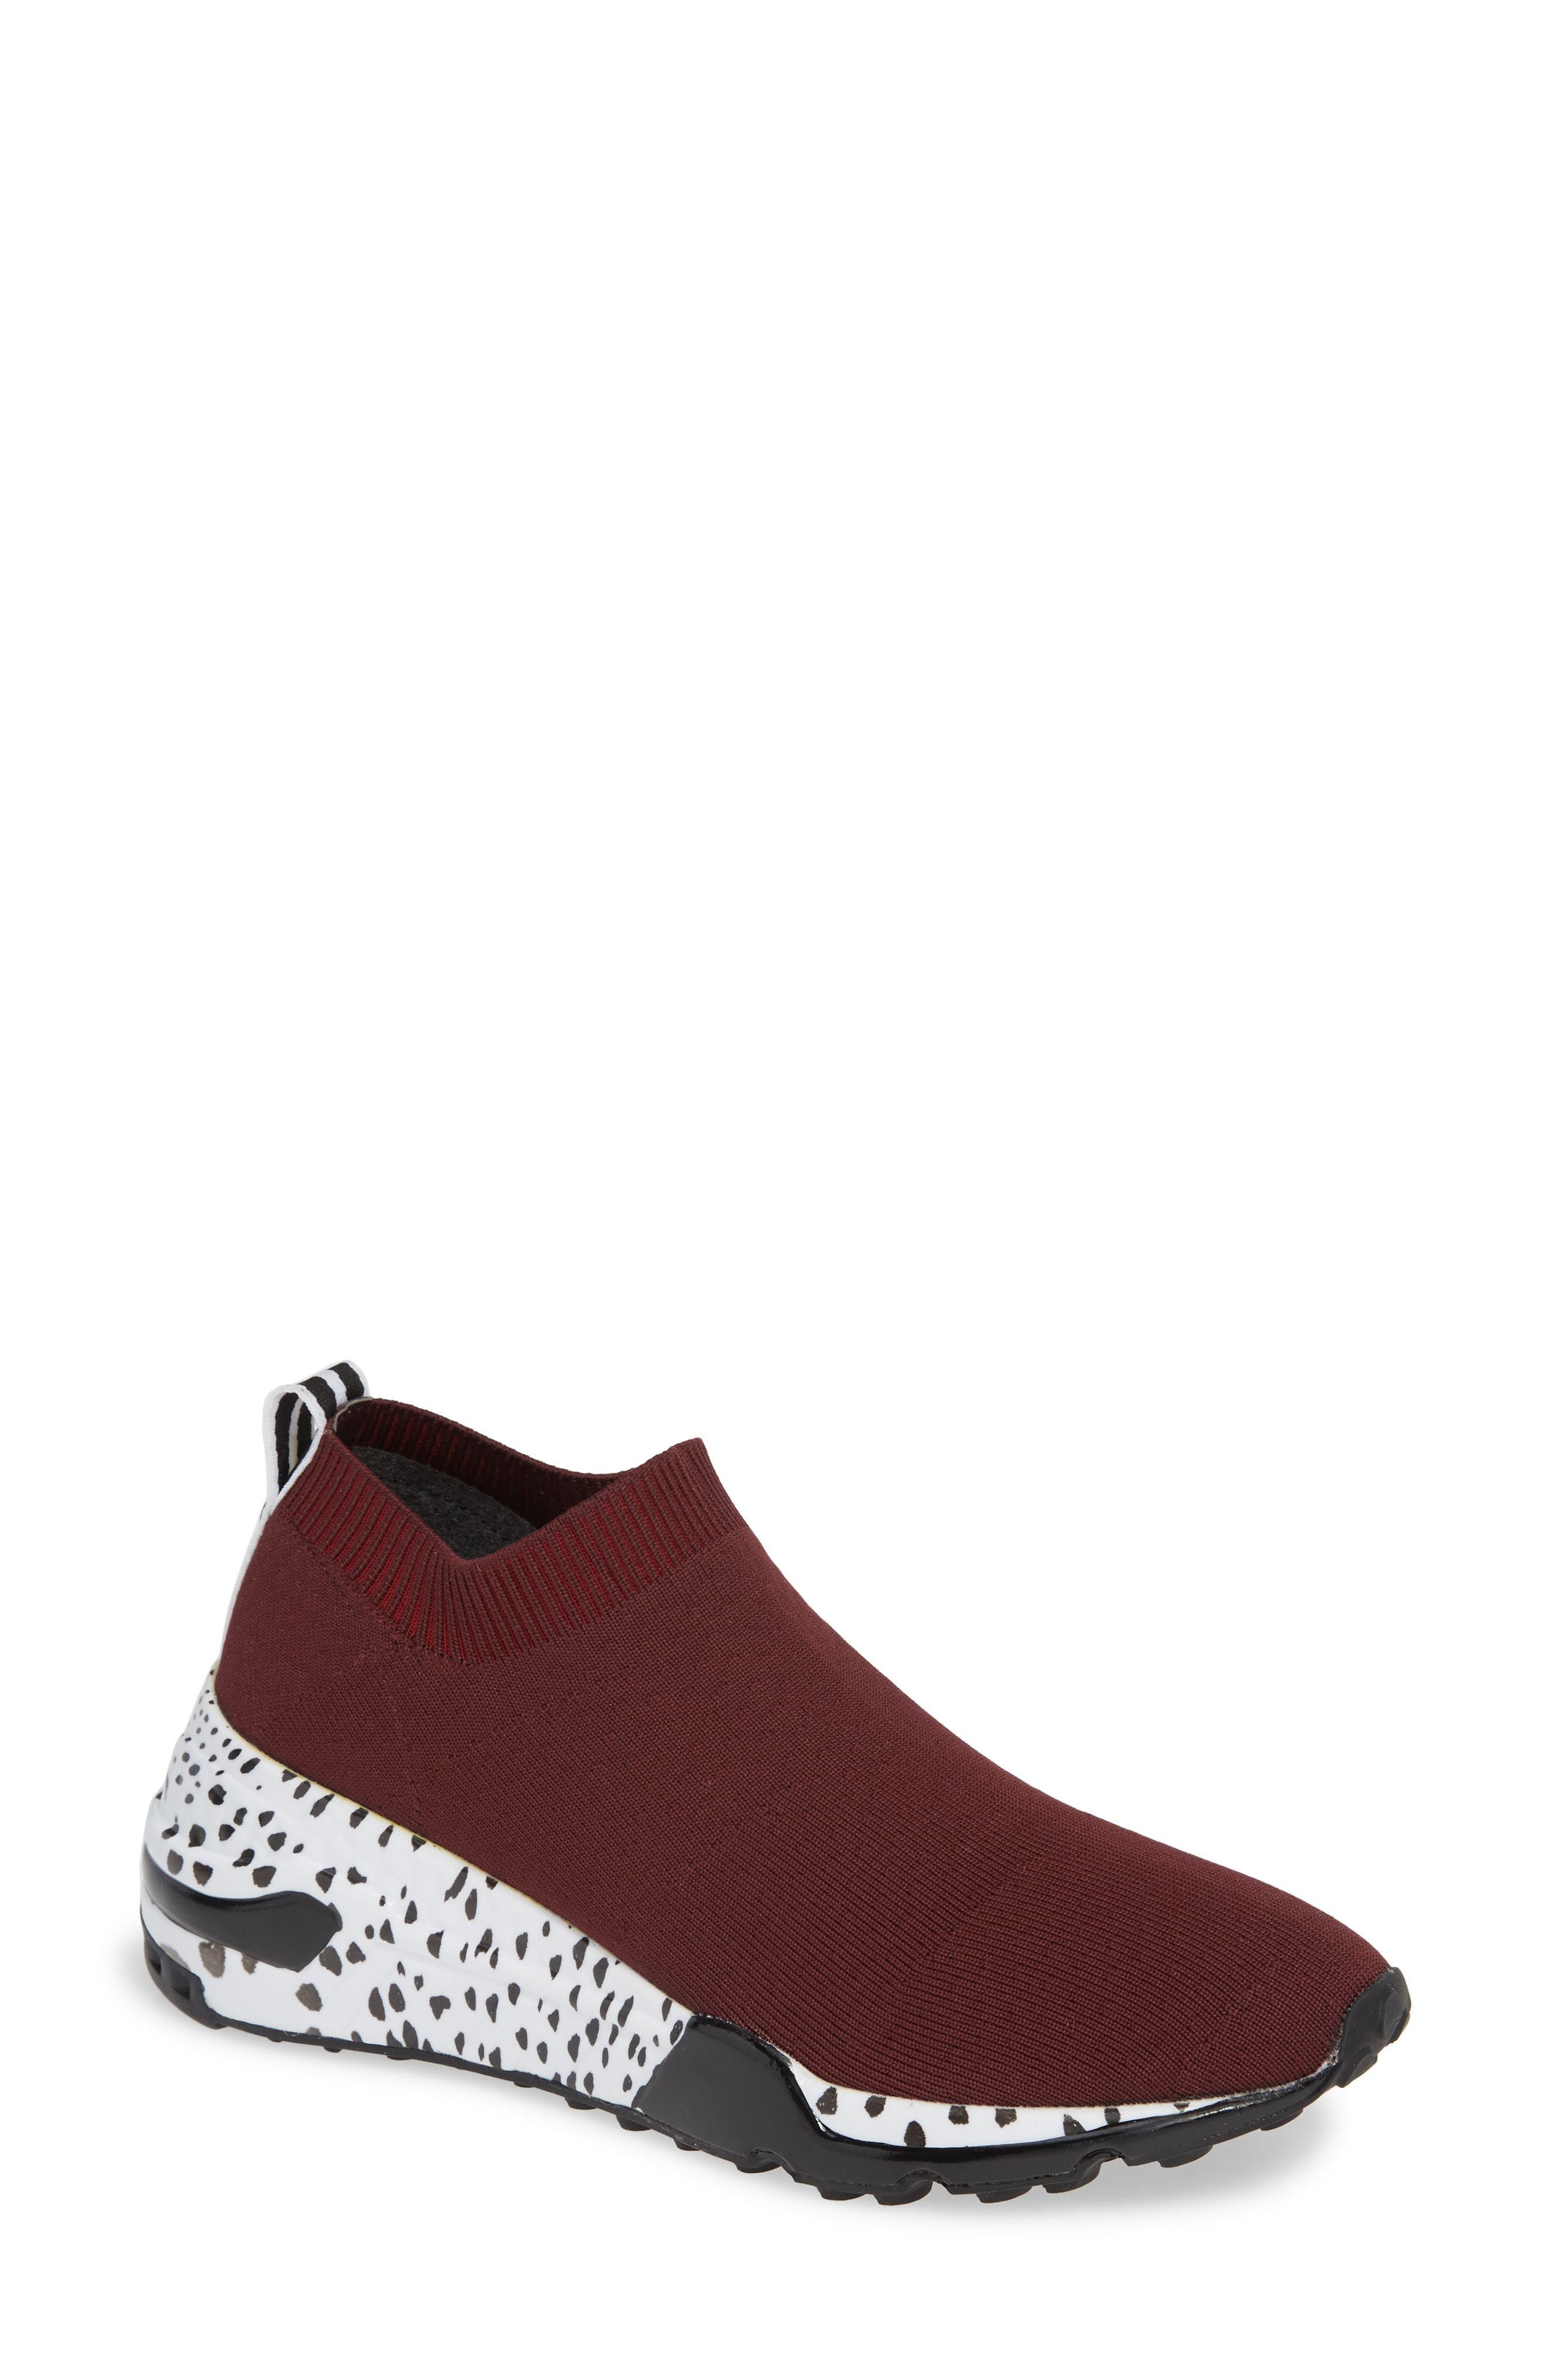 03bdb3520bd5f2 ... Steve Madden Cloud Sock Wedge Sneaker